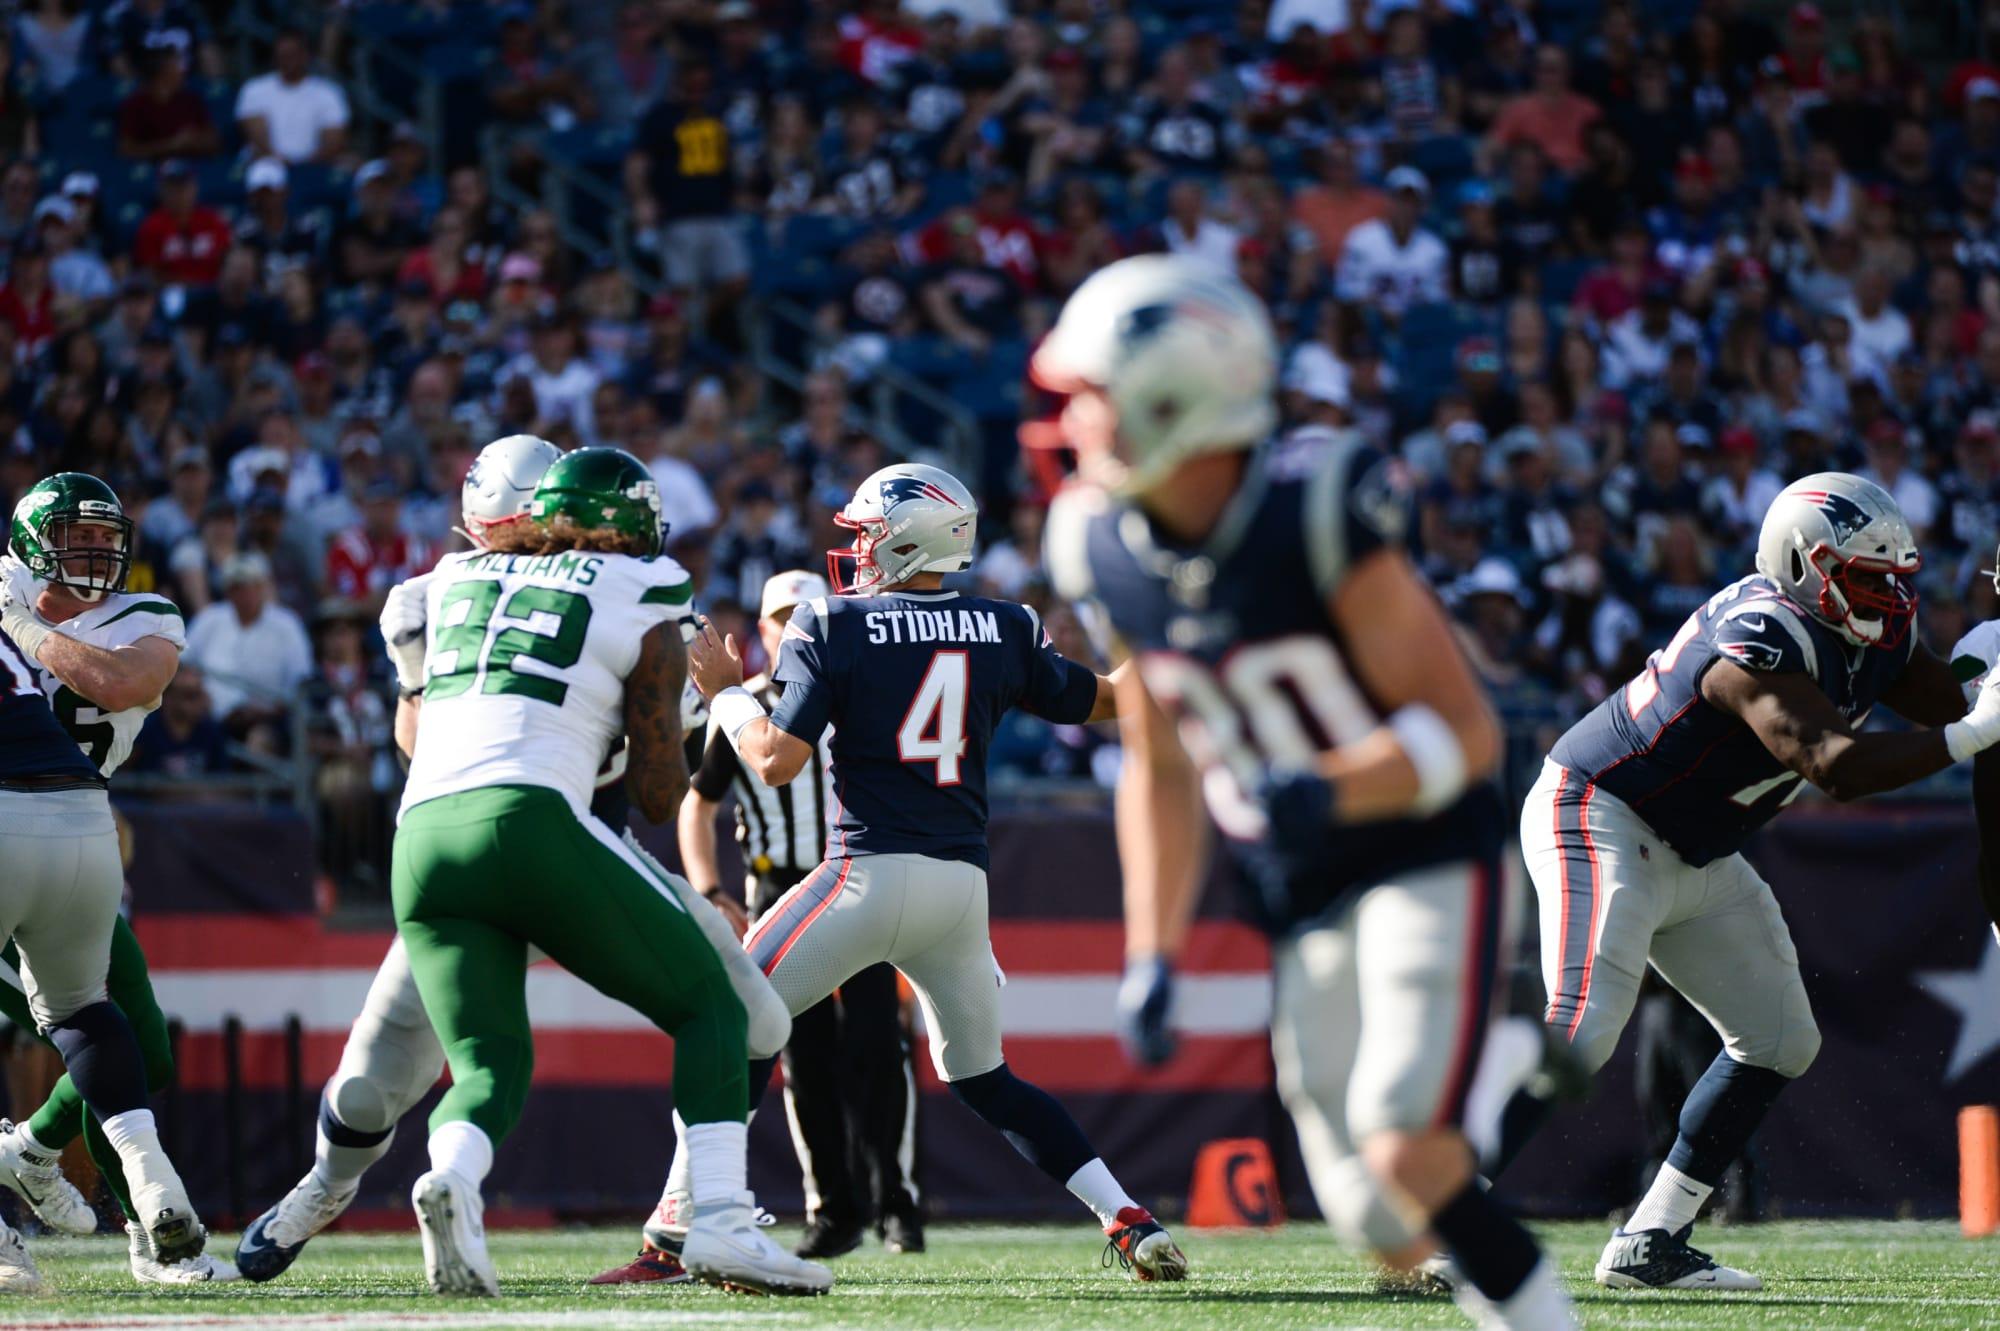 New England Patriots: Jarrett Stidham capable of leading a playoff run